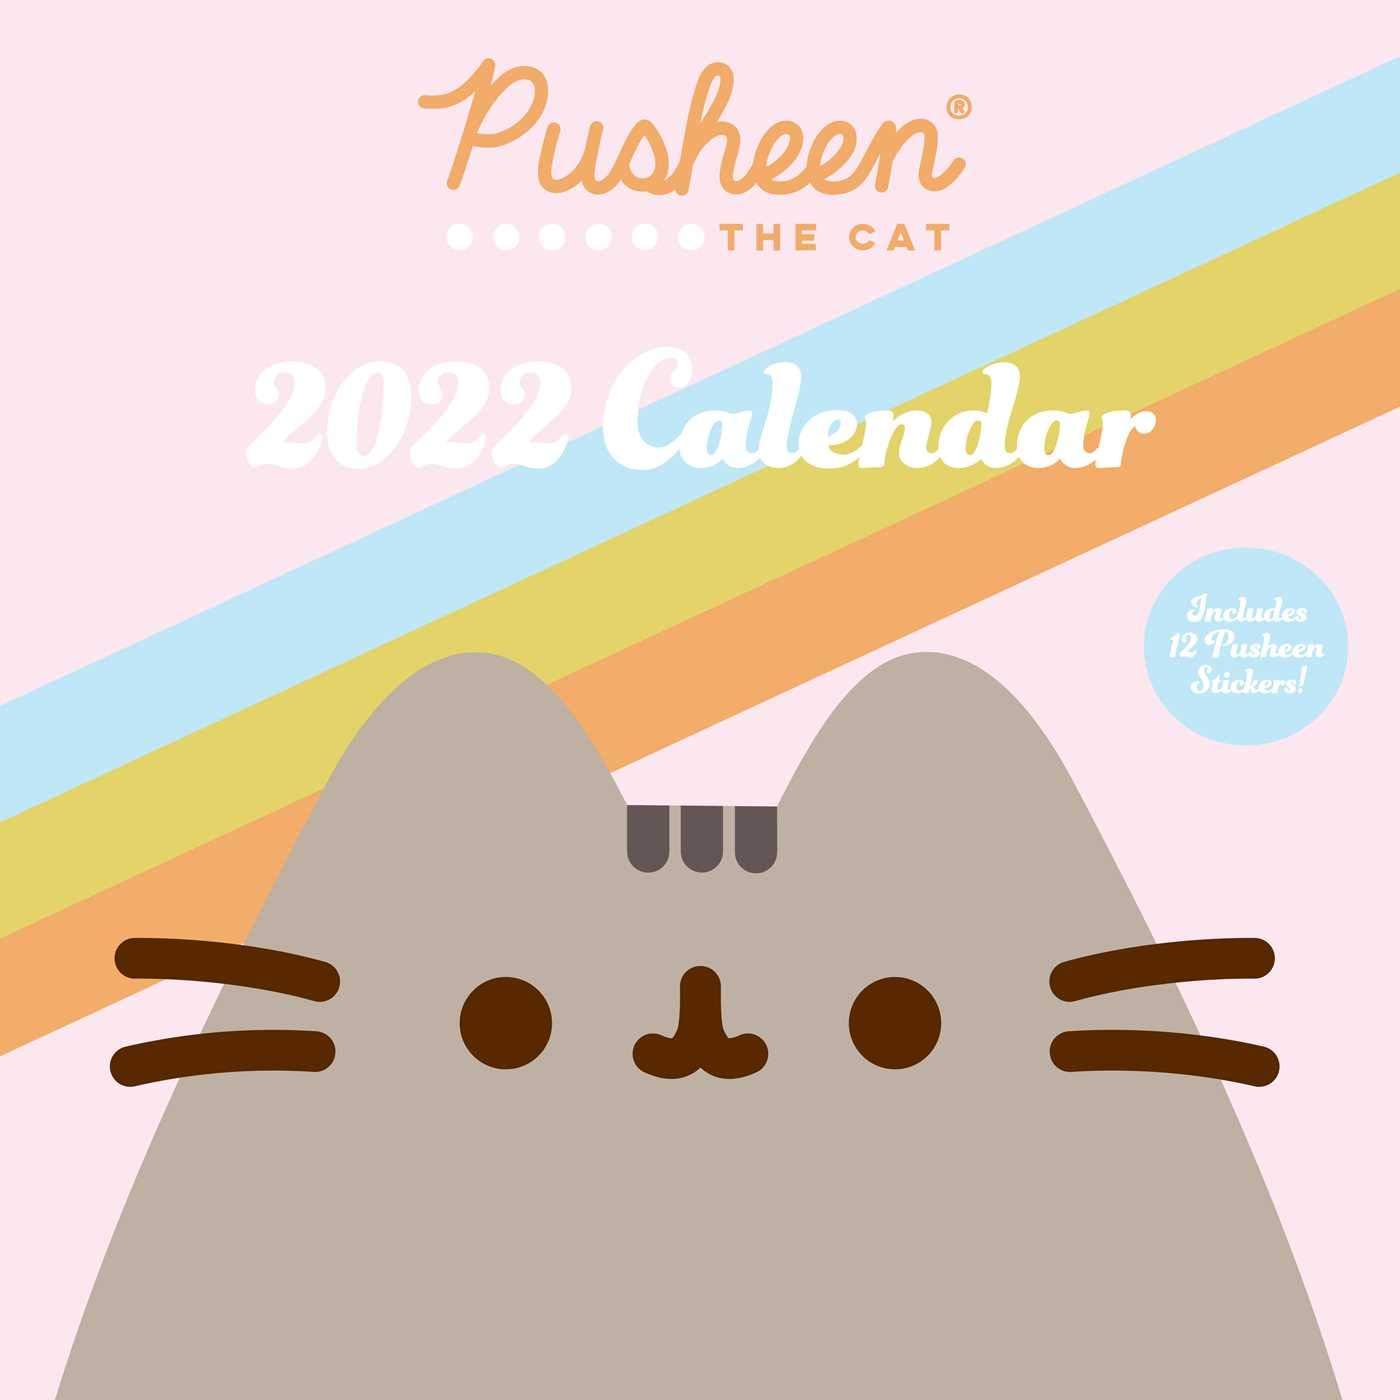 Cat Calendar 2022.Buy Pusheen 2022 Wall Calendar Book Online At Low Prices In India Pusheen 2022 Wall Calendar Reviews Ratings Amazon In